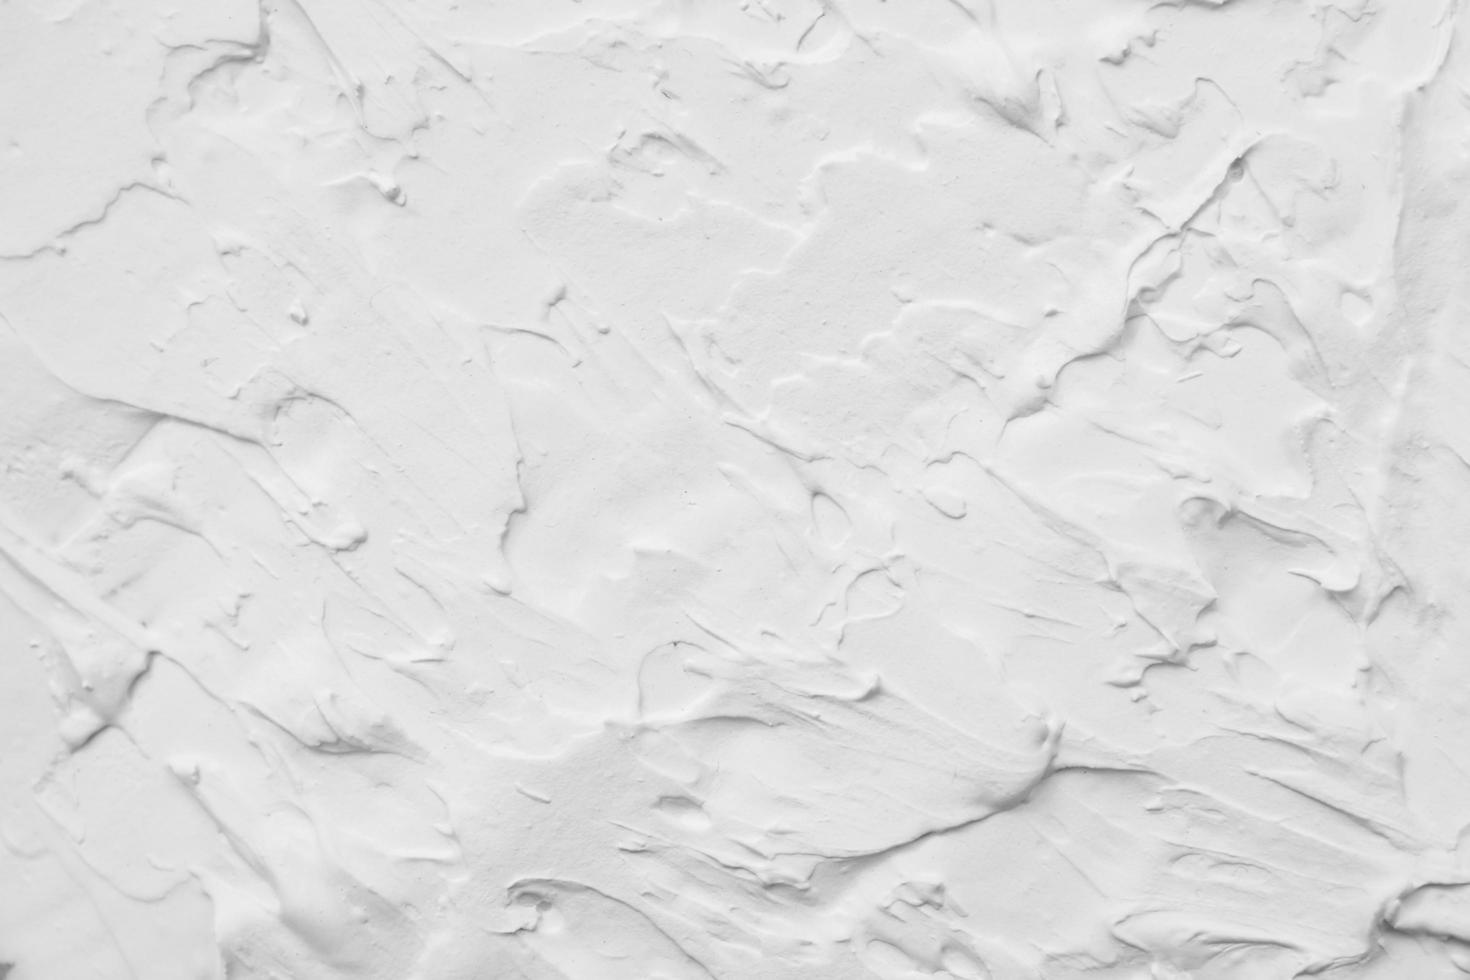 cemento bianco grunge foto